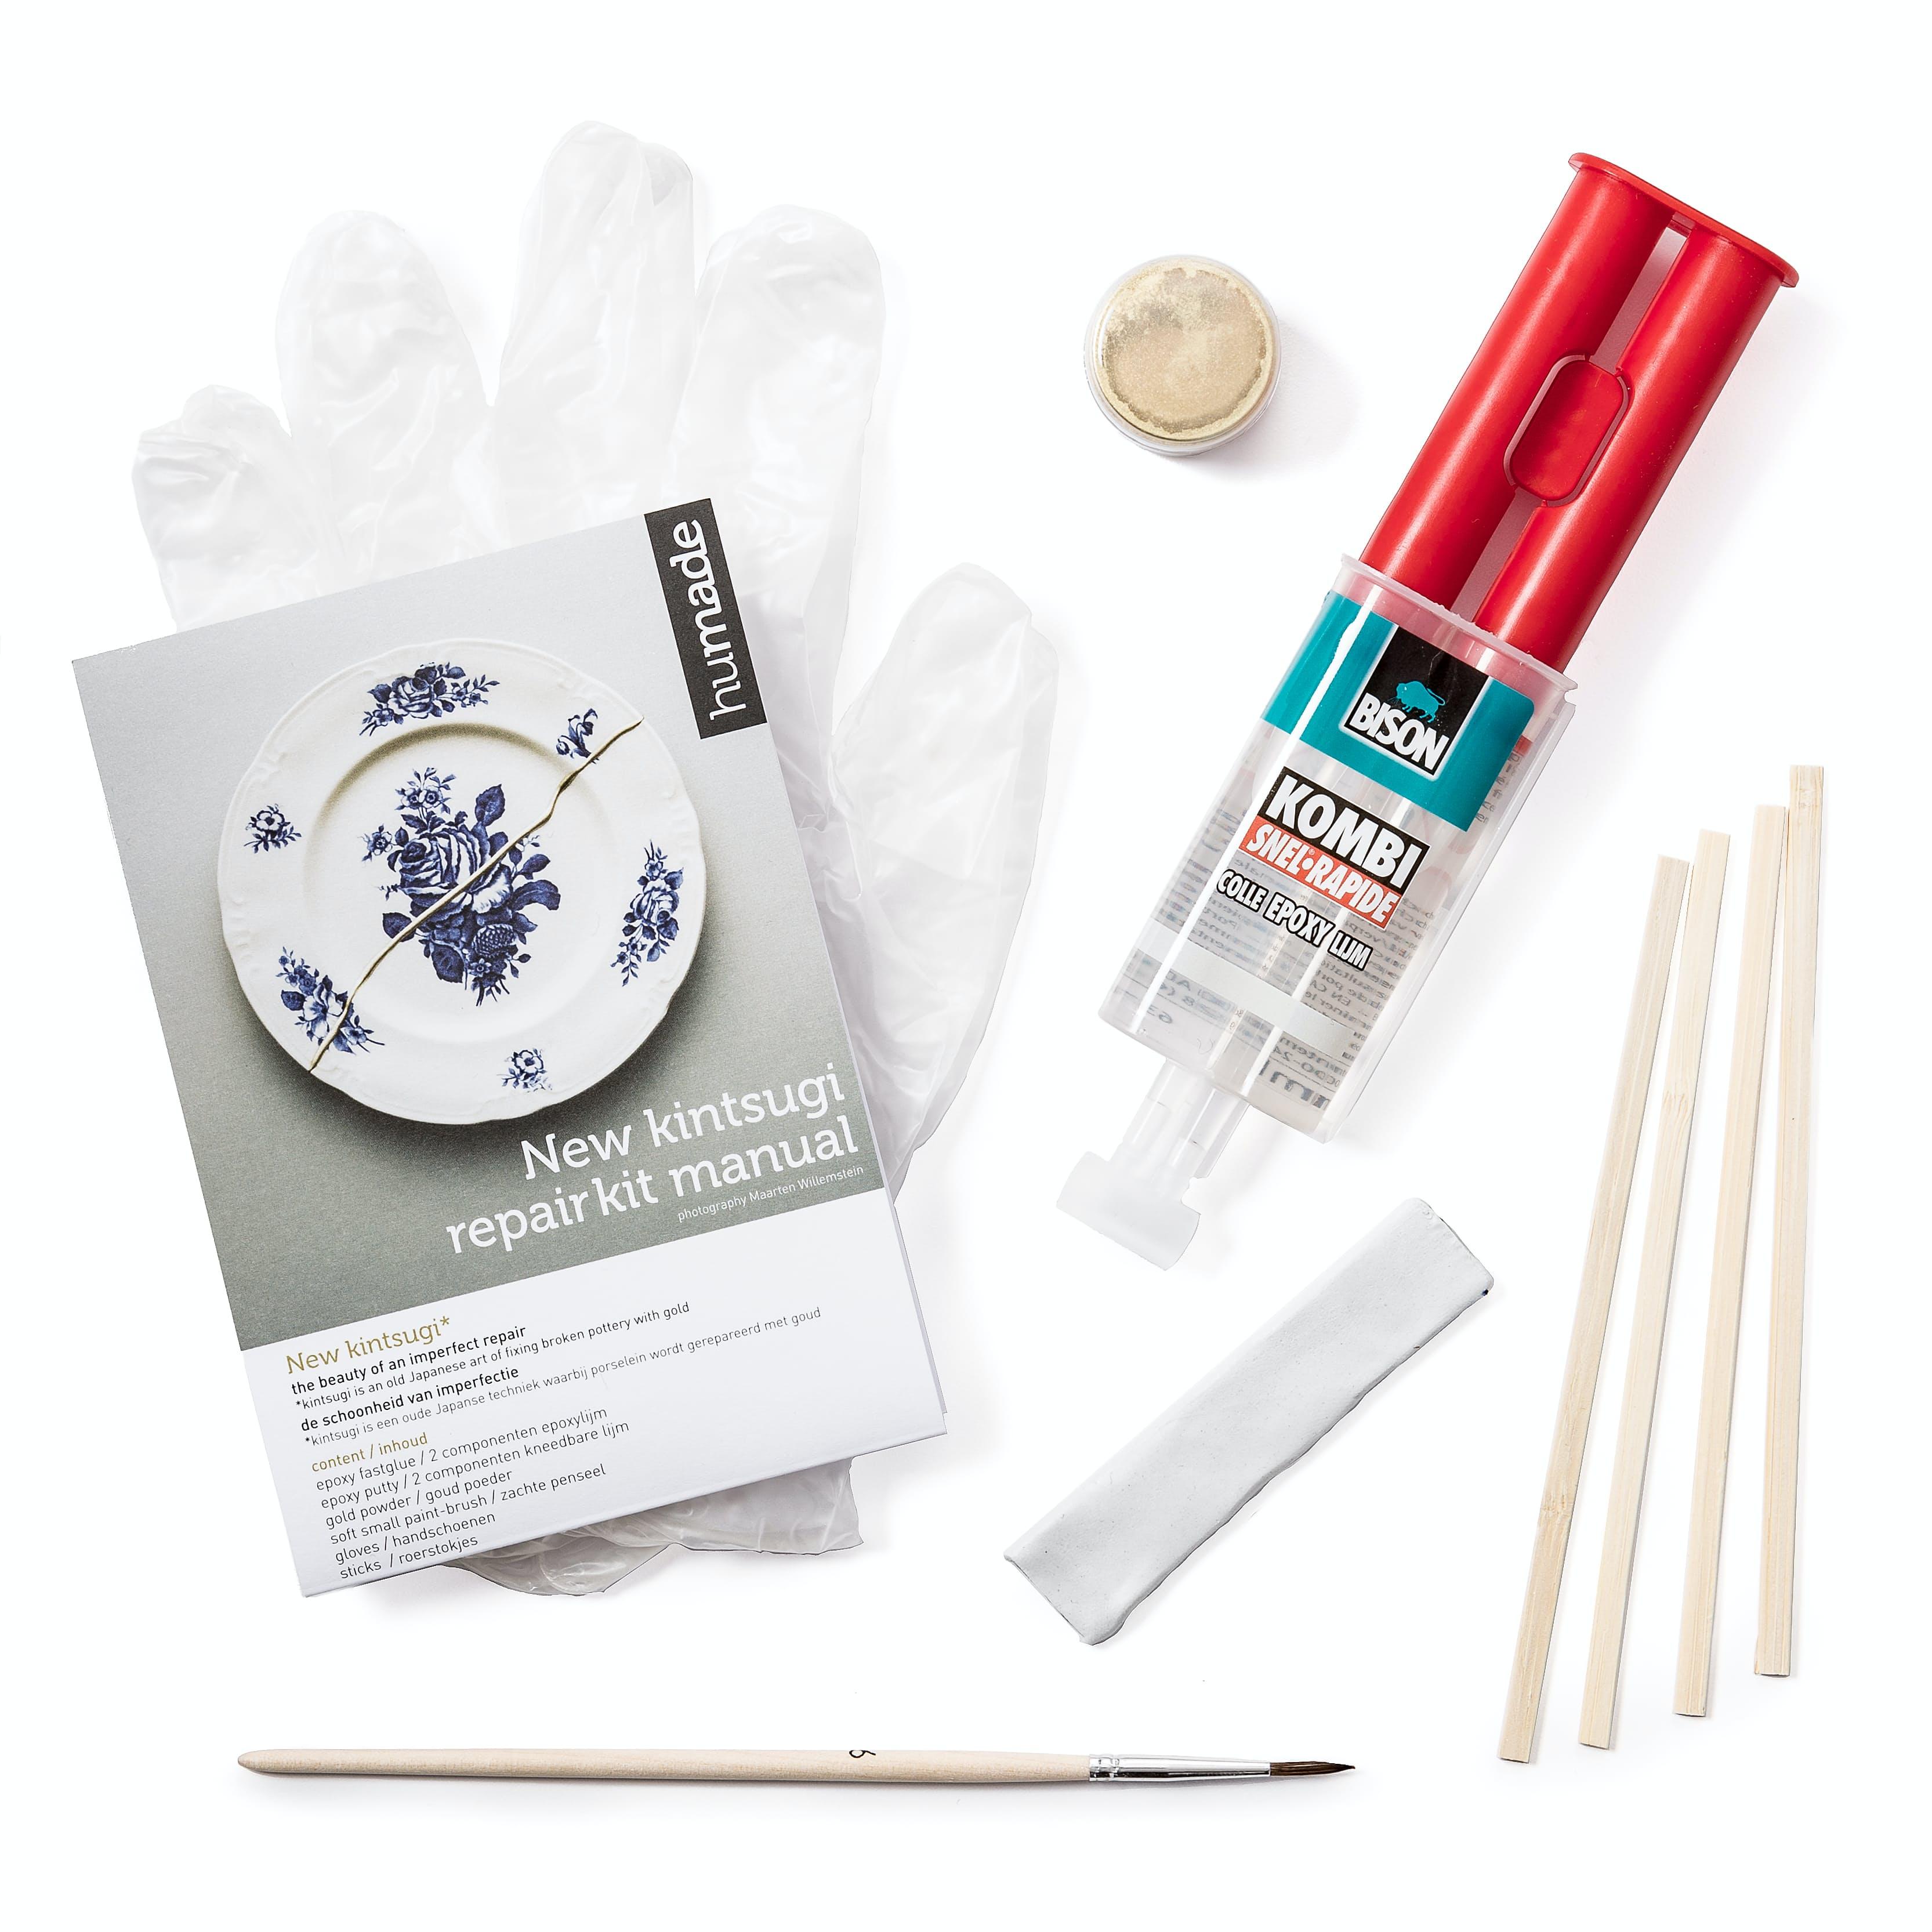 Txg08qkayx humade kintsugi ceramic pottery repair kit gold 0 original